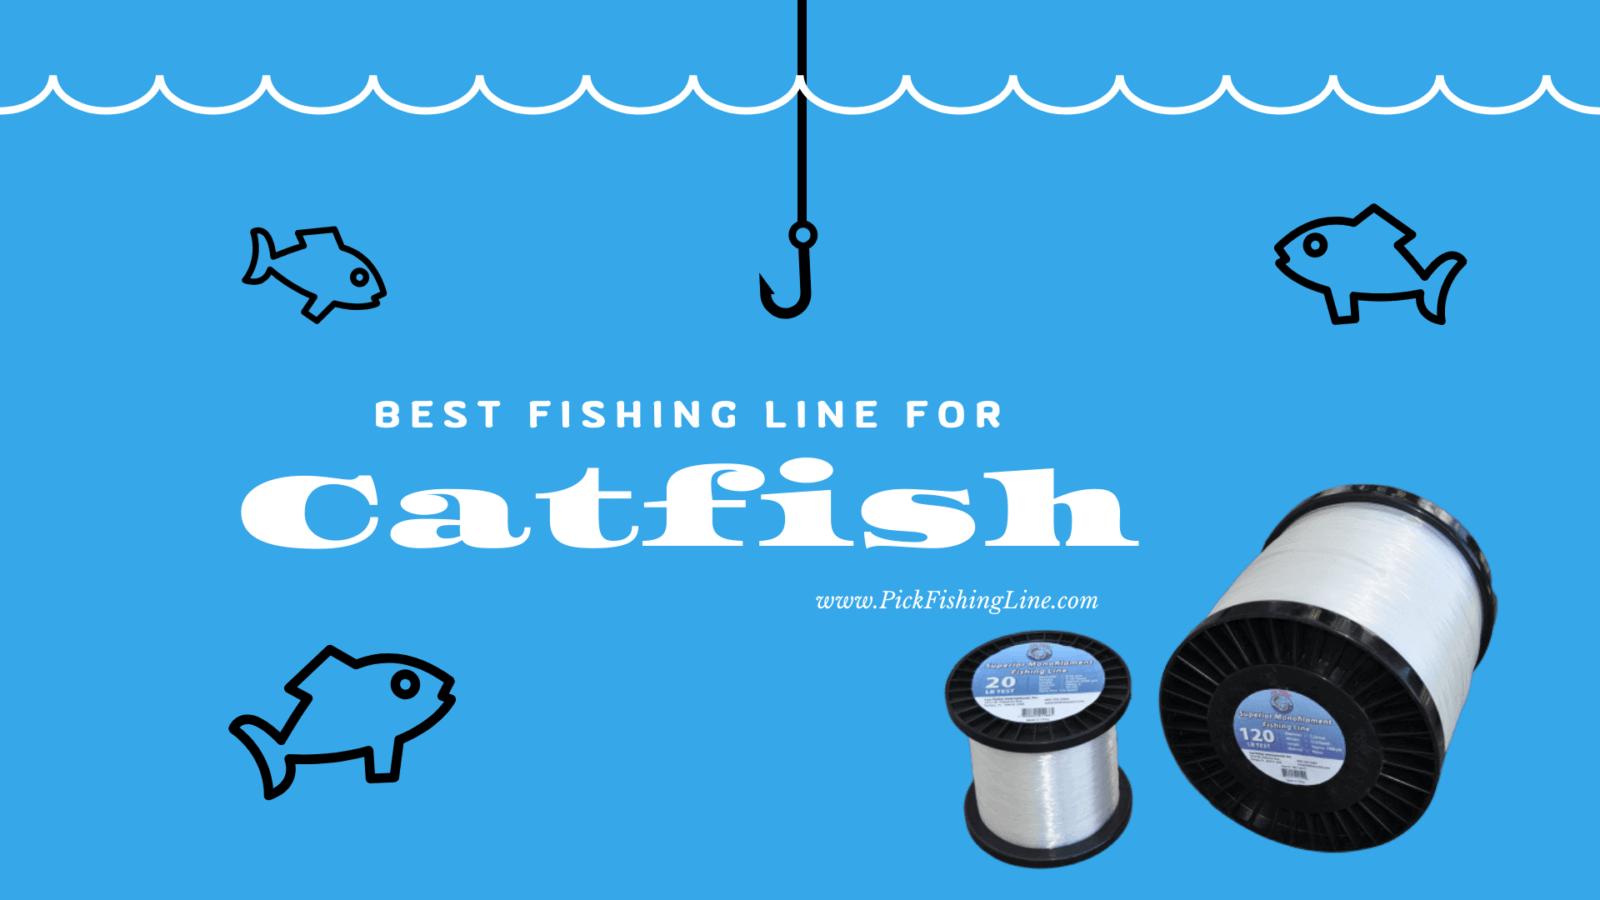 Best Fishing Line For Catfish